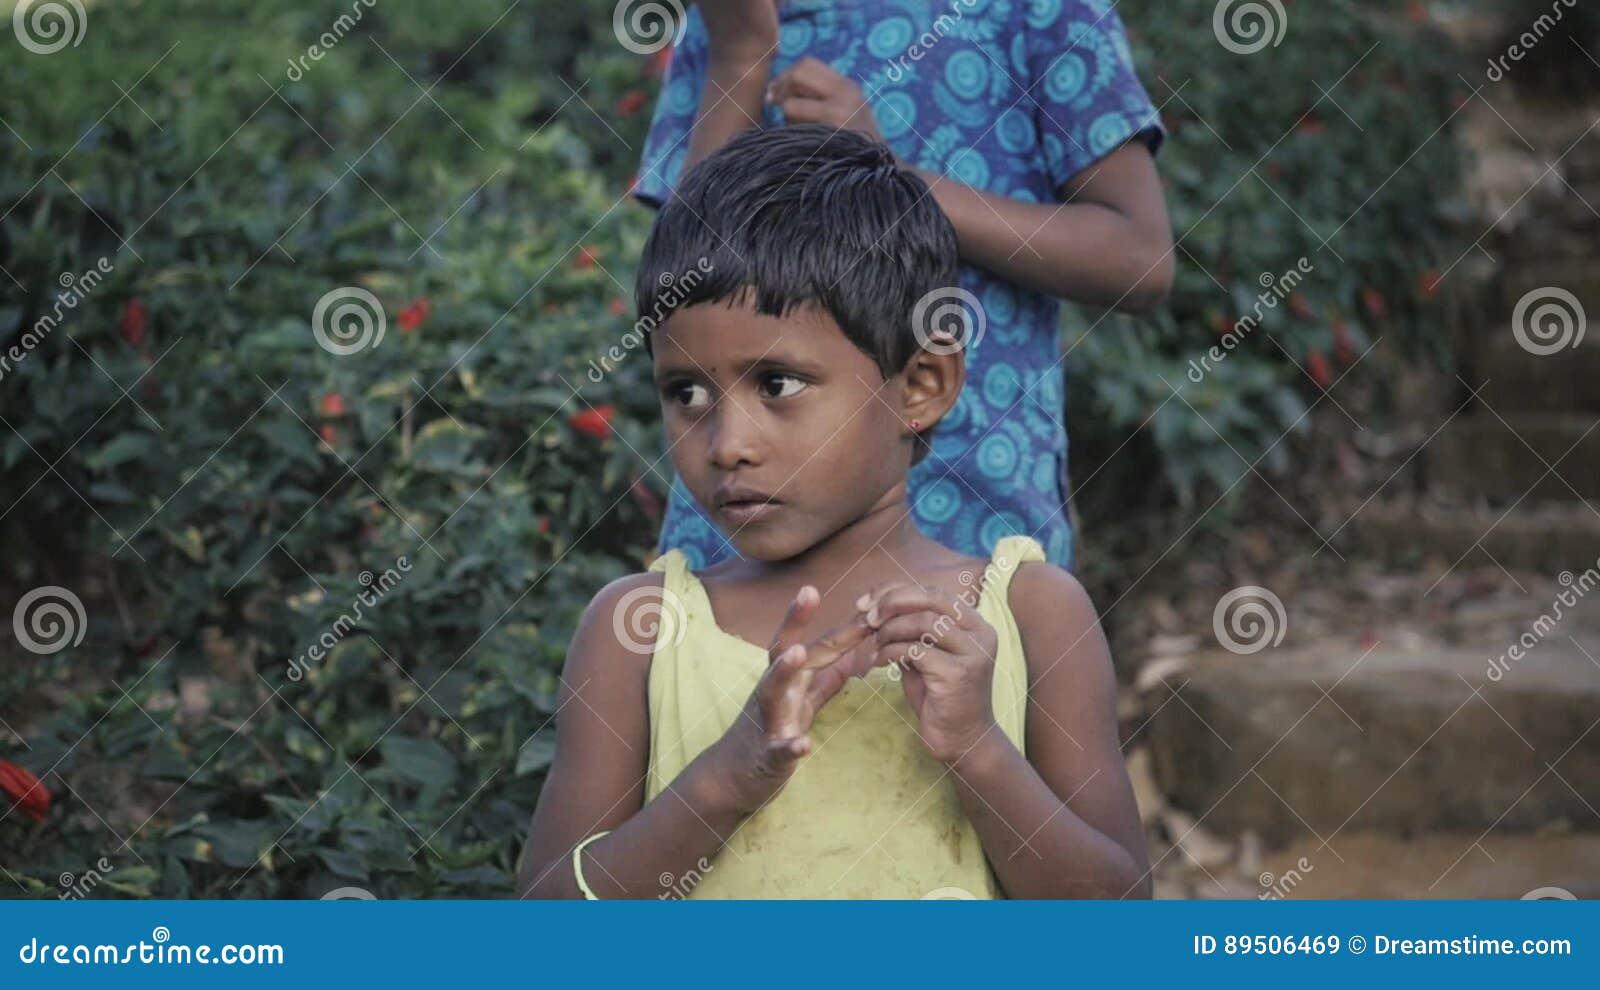 Rilanka saxy images boy girl